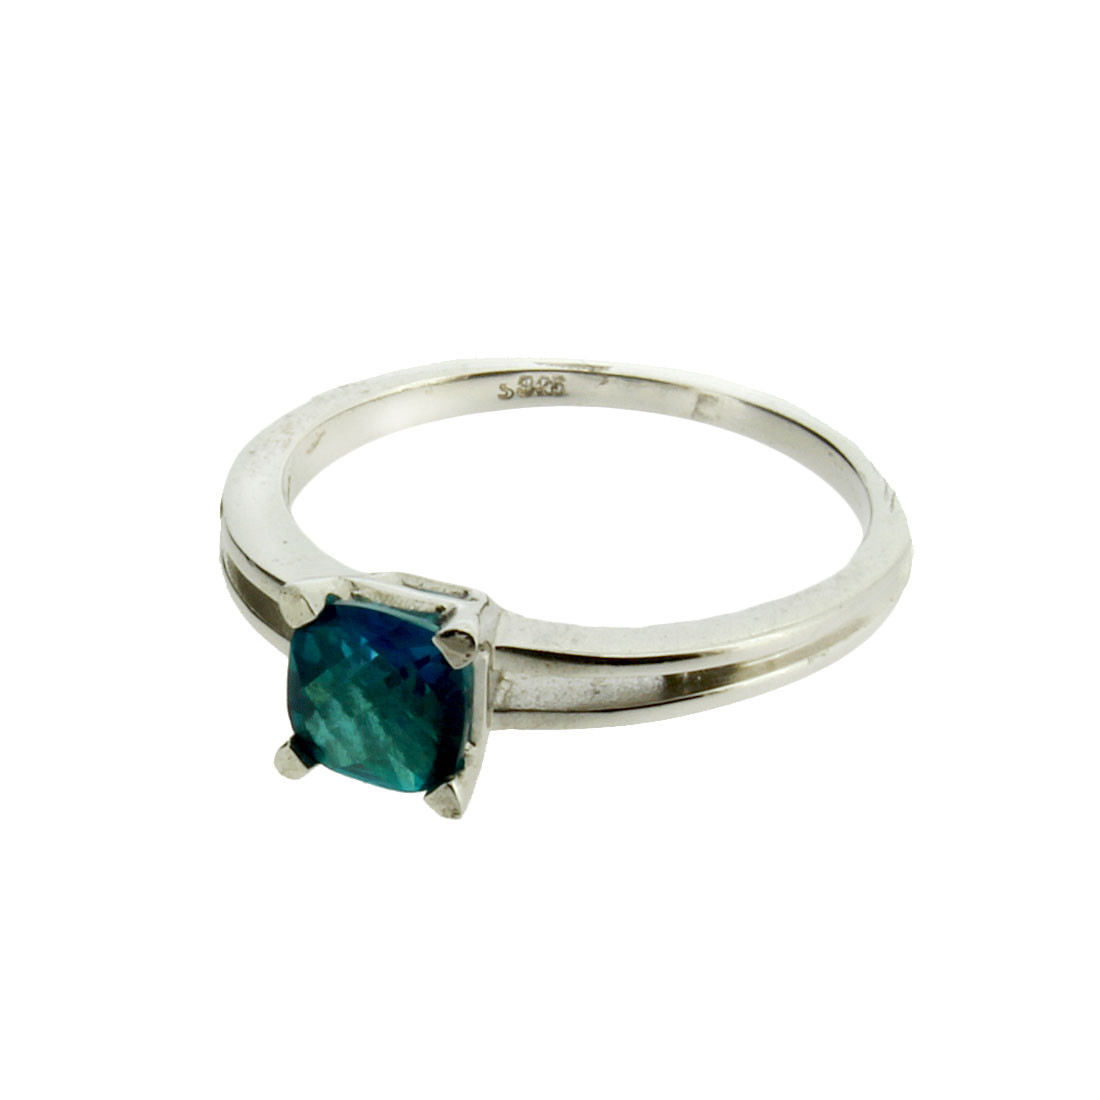 Small Ocean Blue Green Topaz Sterling Silver Ring